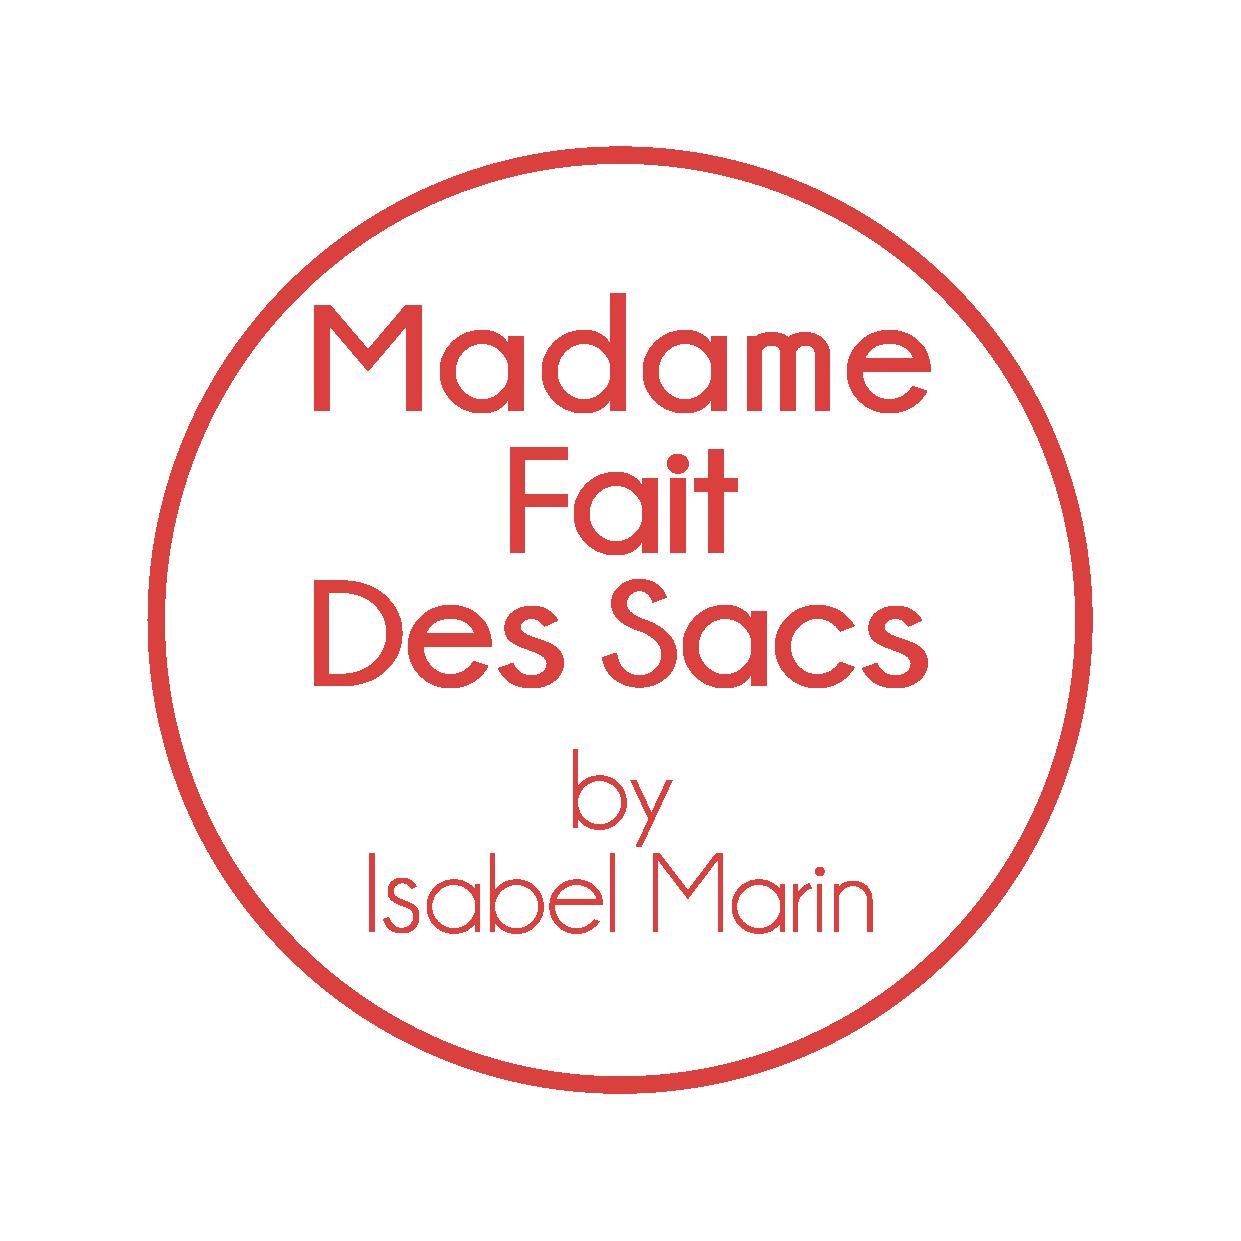 Mfds logo grenadine 2017